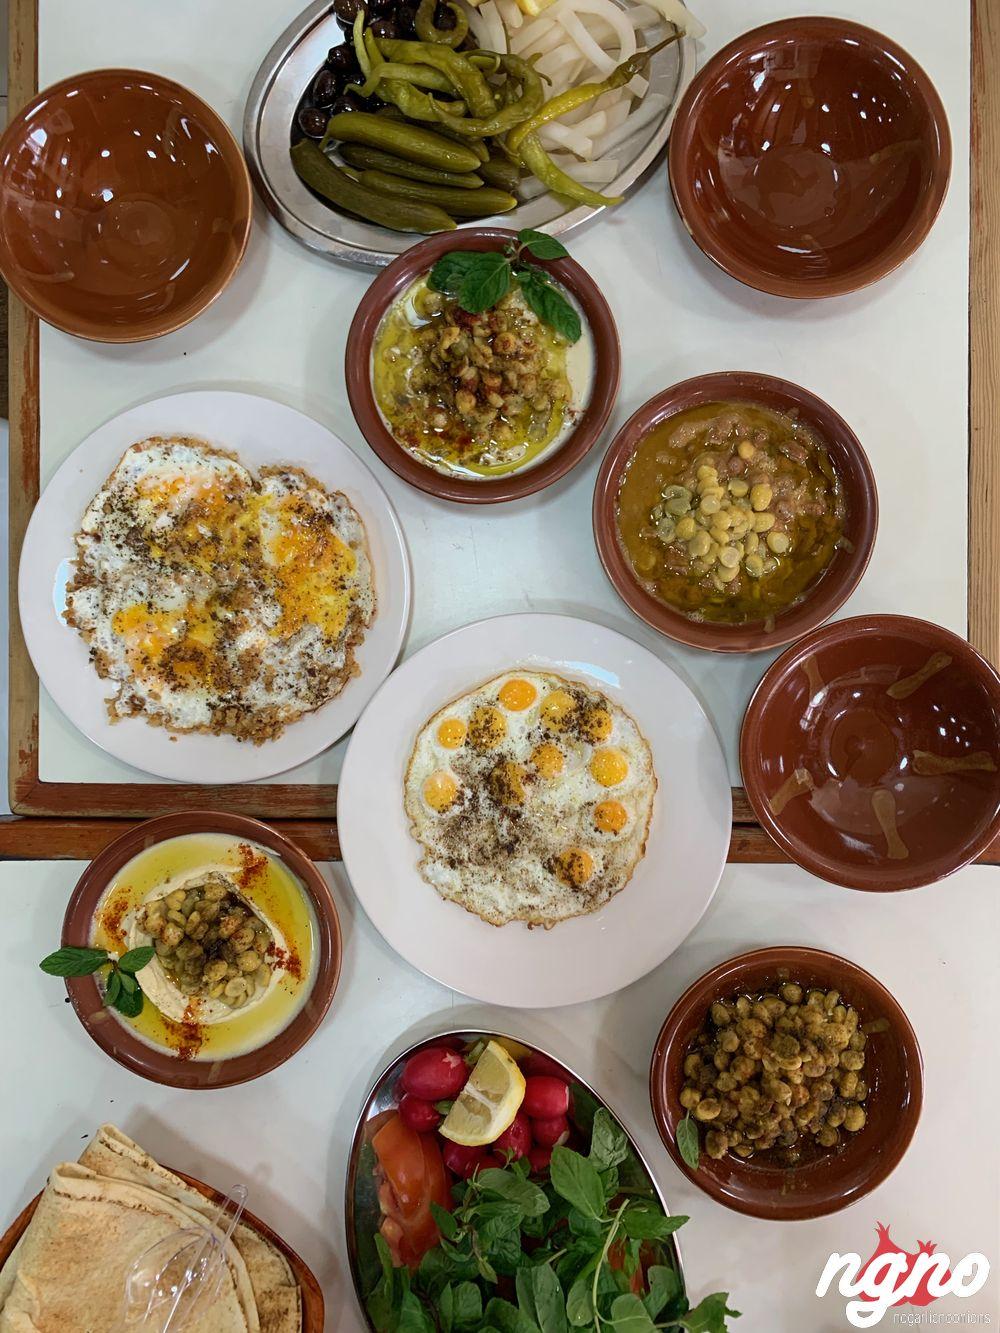 foul-fatteh-hummus-lebanon-nogarlicnoonions-122019-03-18-08-13-24